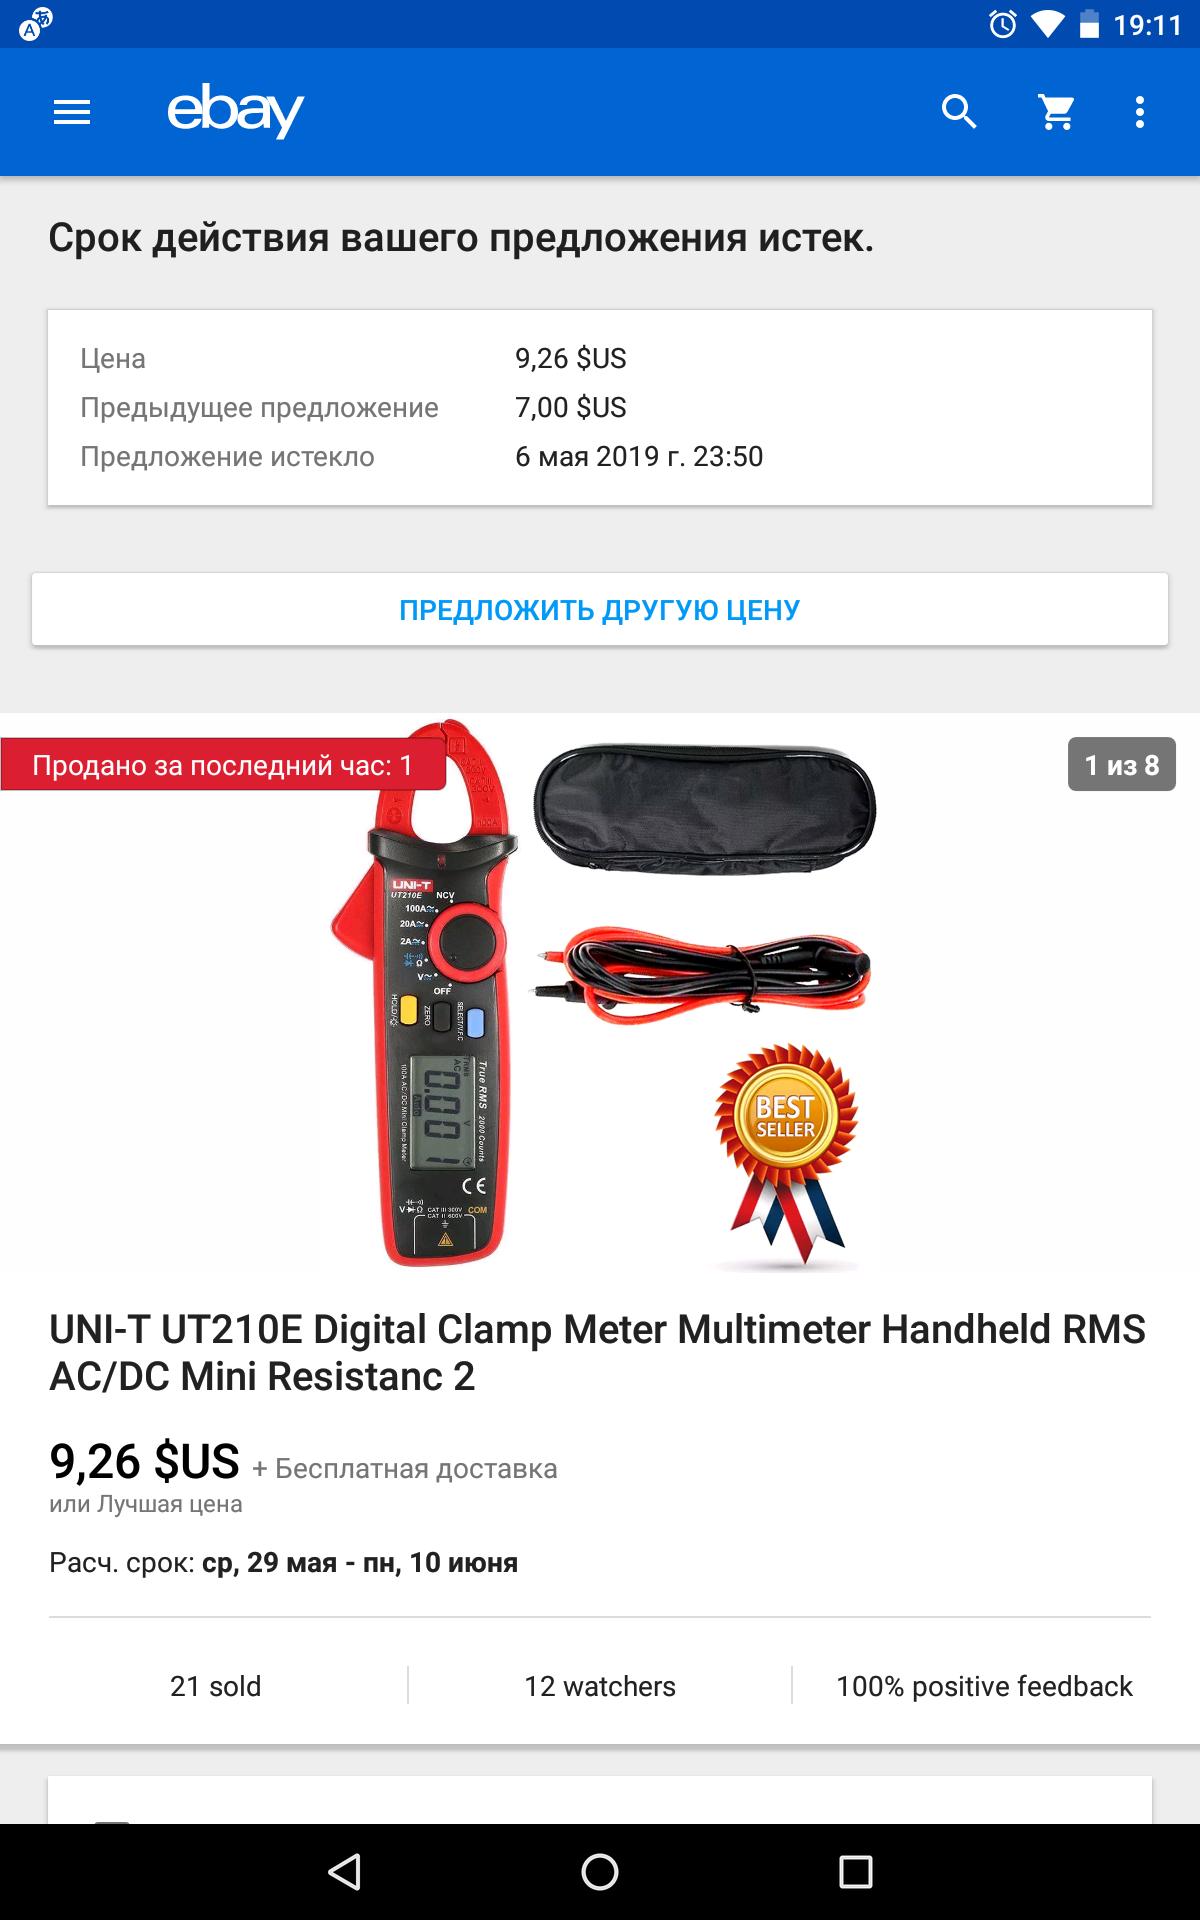 screenshot_20190507-191107-png.385187